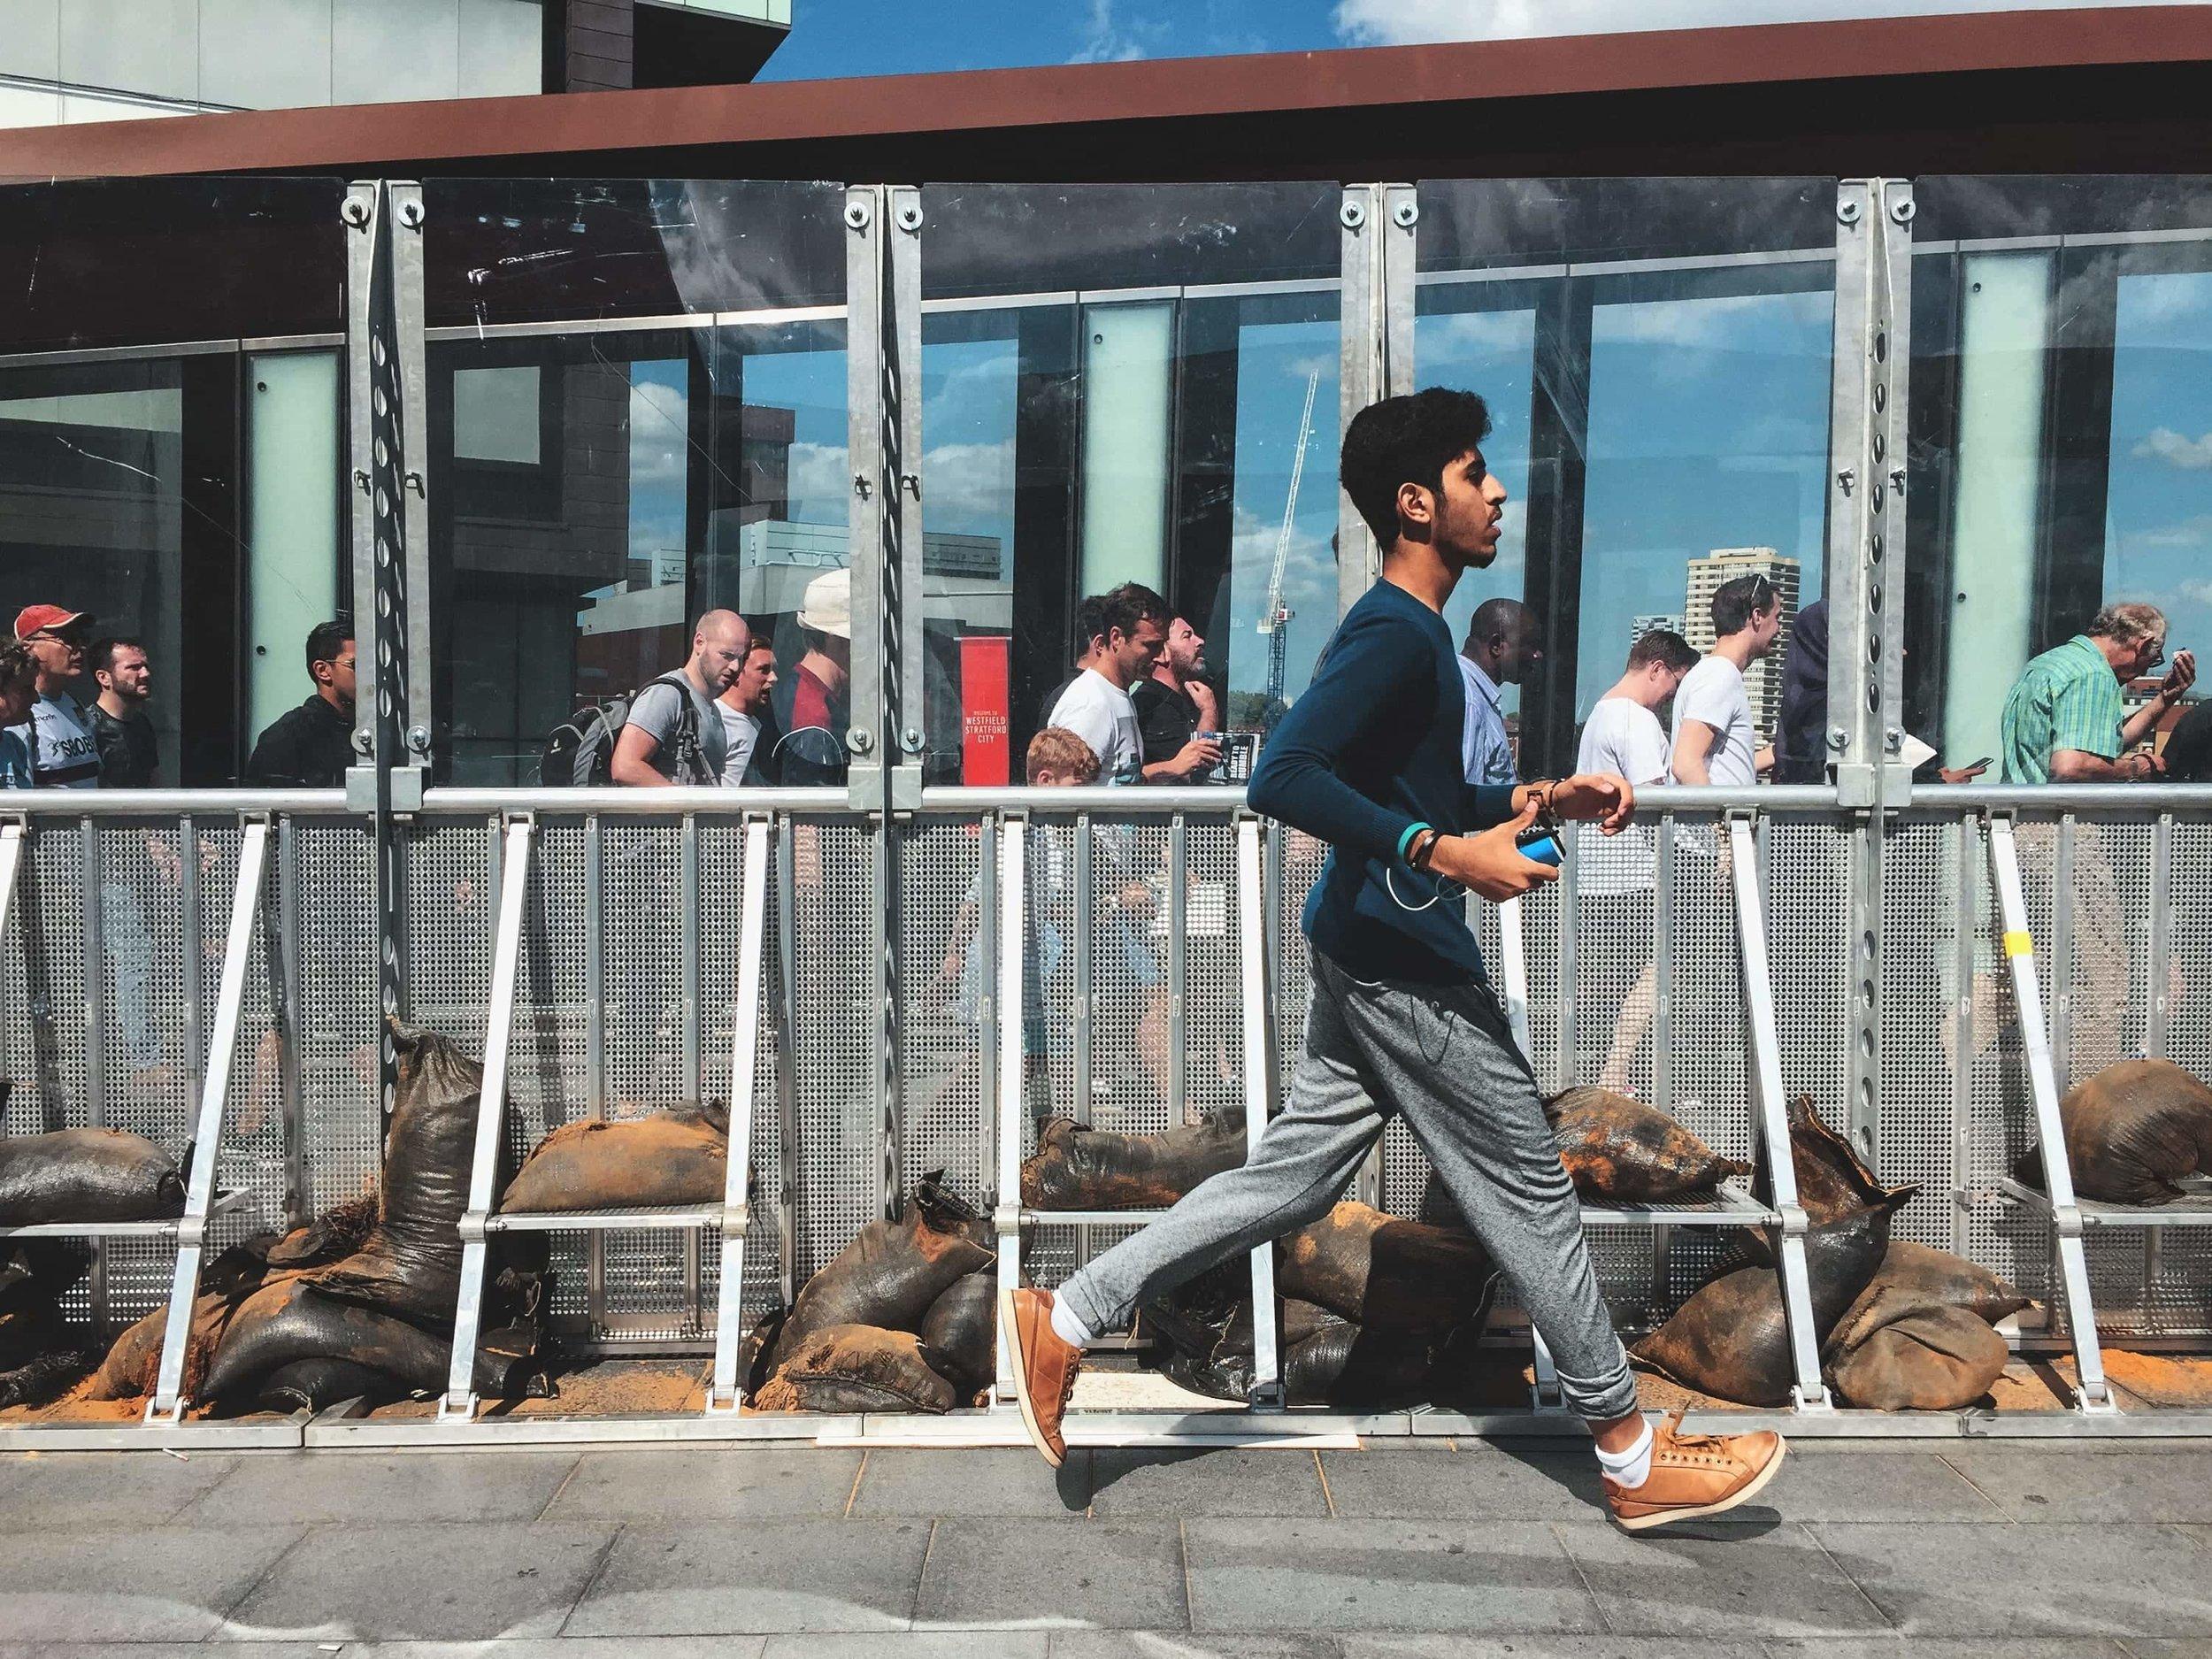 street-documentary-iphone-photography-fabio-burrelli-1.jpg